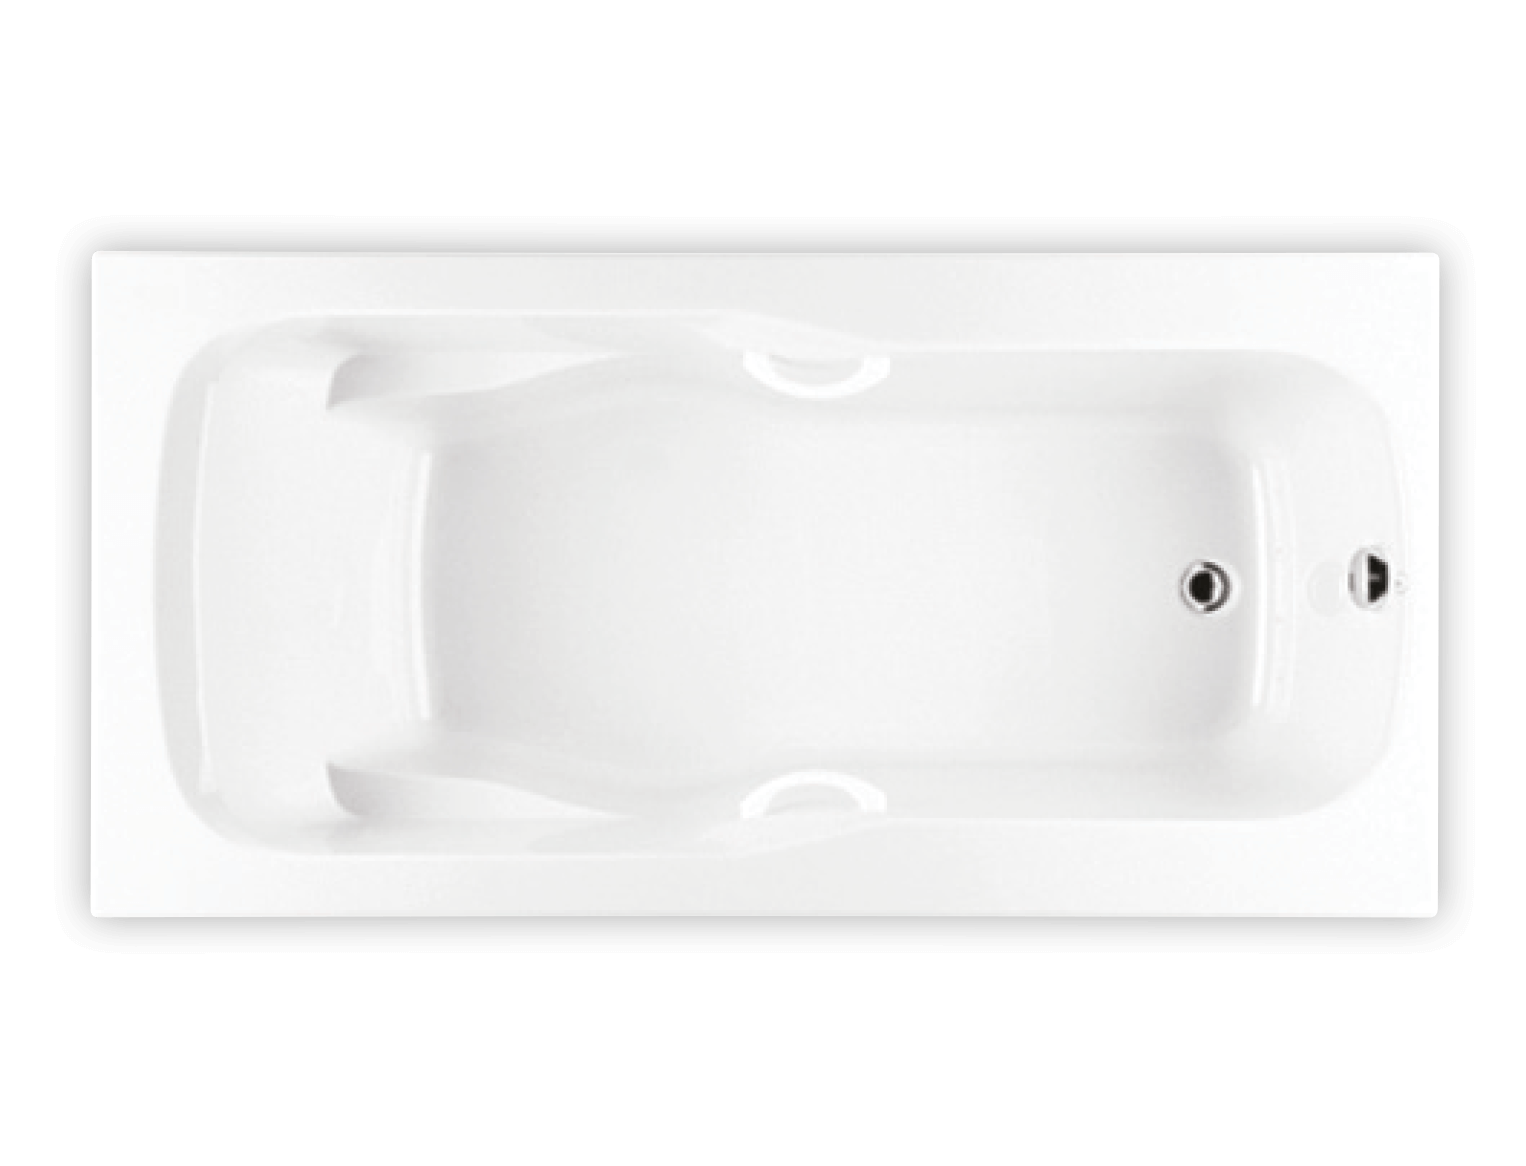 Bainultra Thalassa 50 alcove drop-in air jet bathtub for your modern bathroom